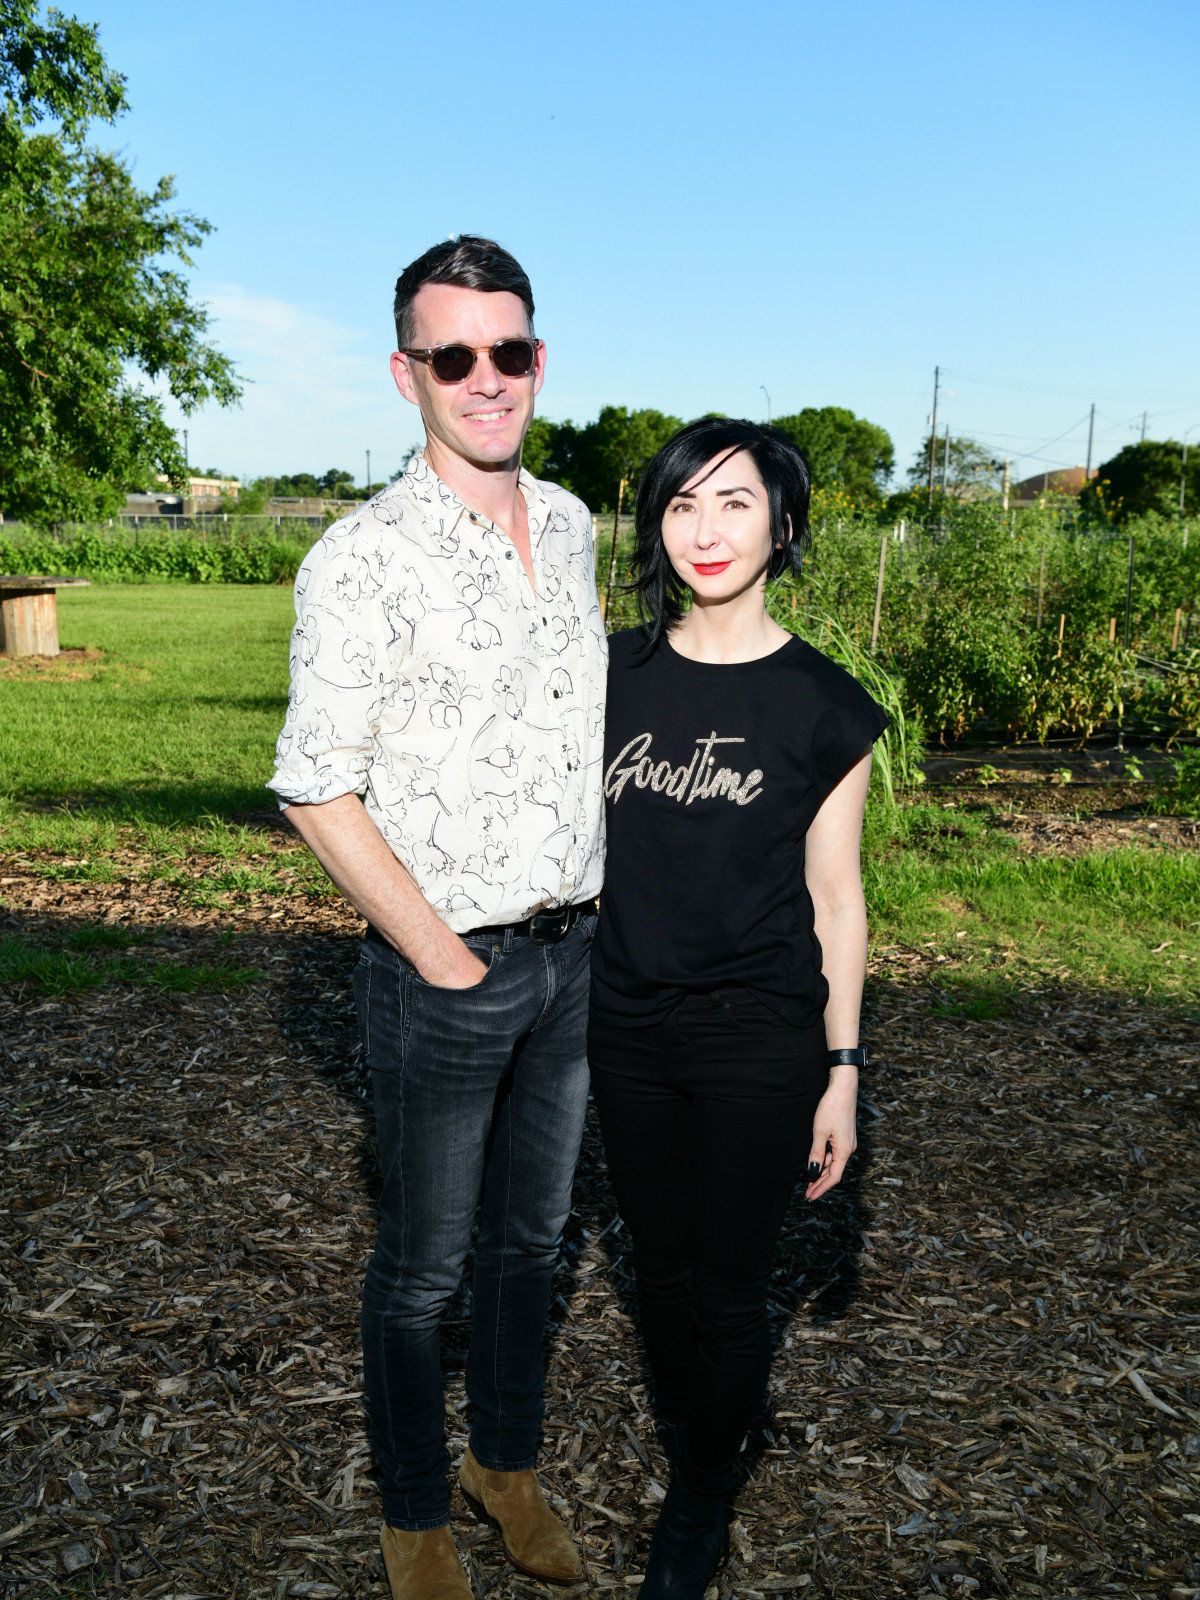 Chefs in the Field Hope Farms Summer 2019 Sverre Carrie Brandsberg-Dahl